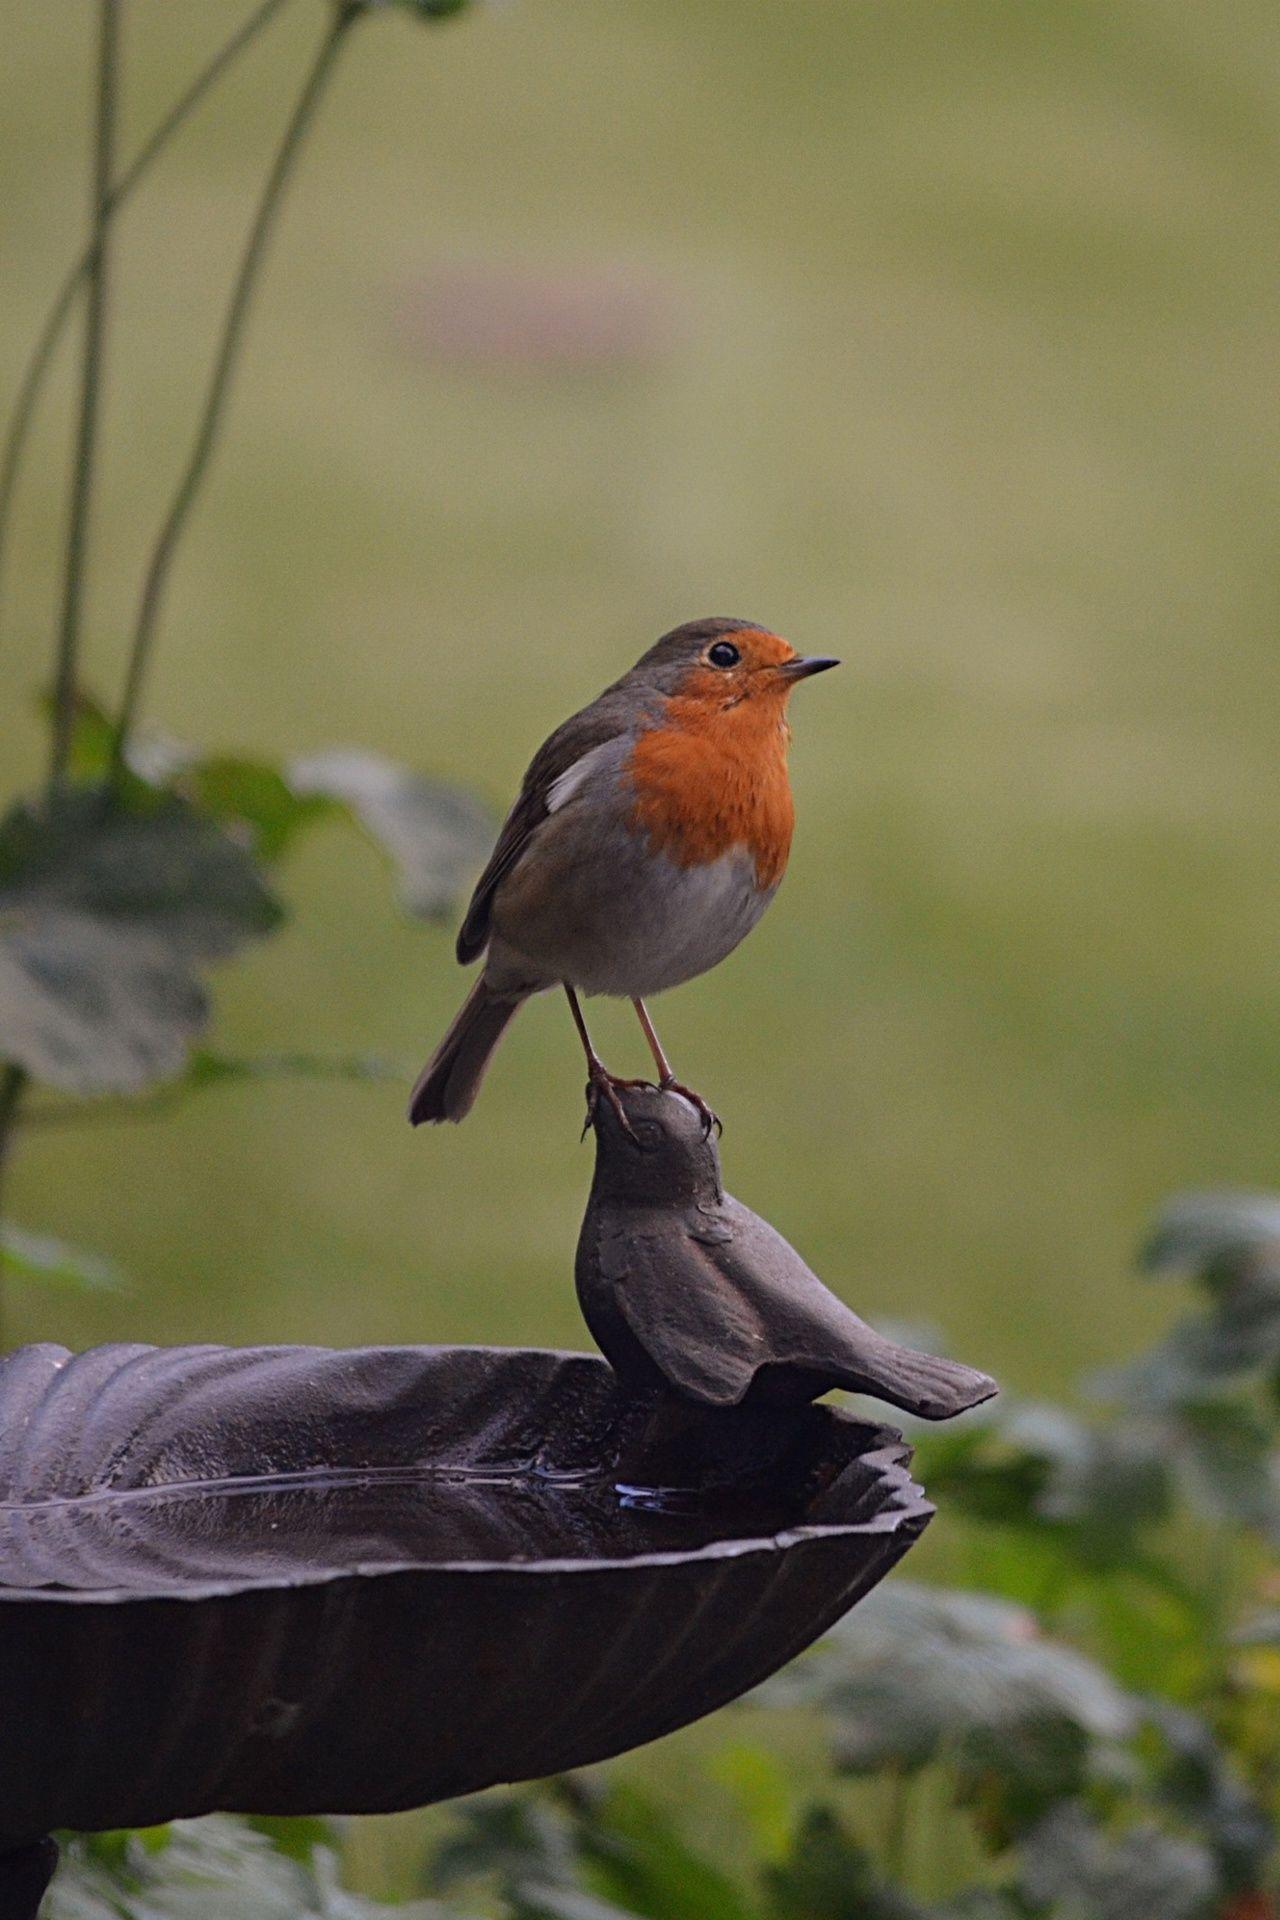 Robins Kitchen Garden City A Real Bird Standing On The Head Of An Ornamental Bird On A